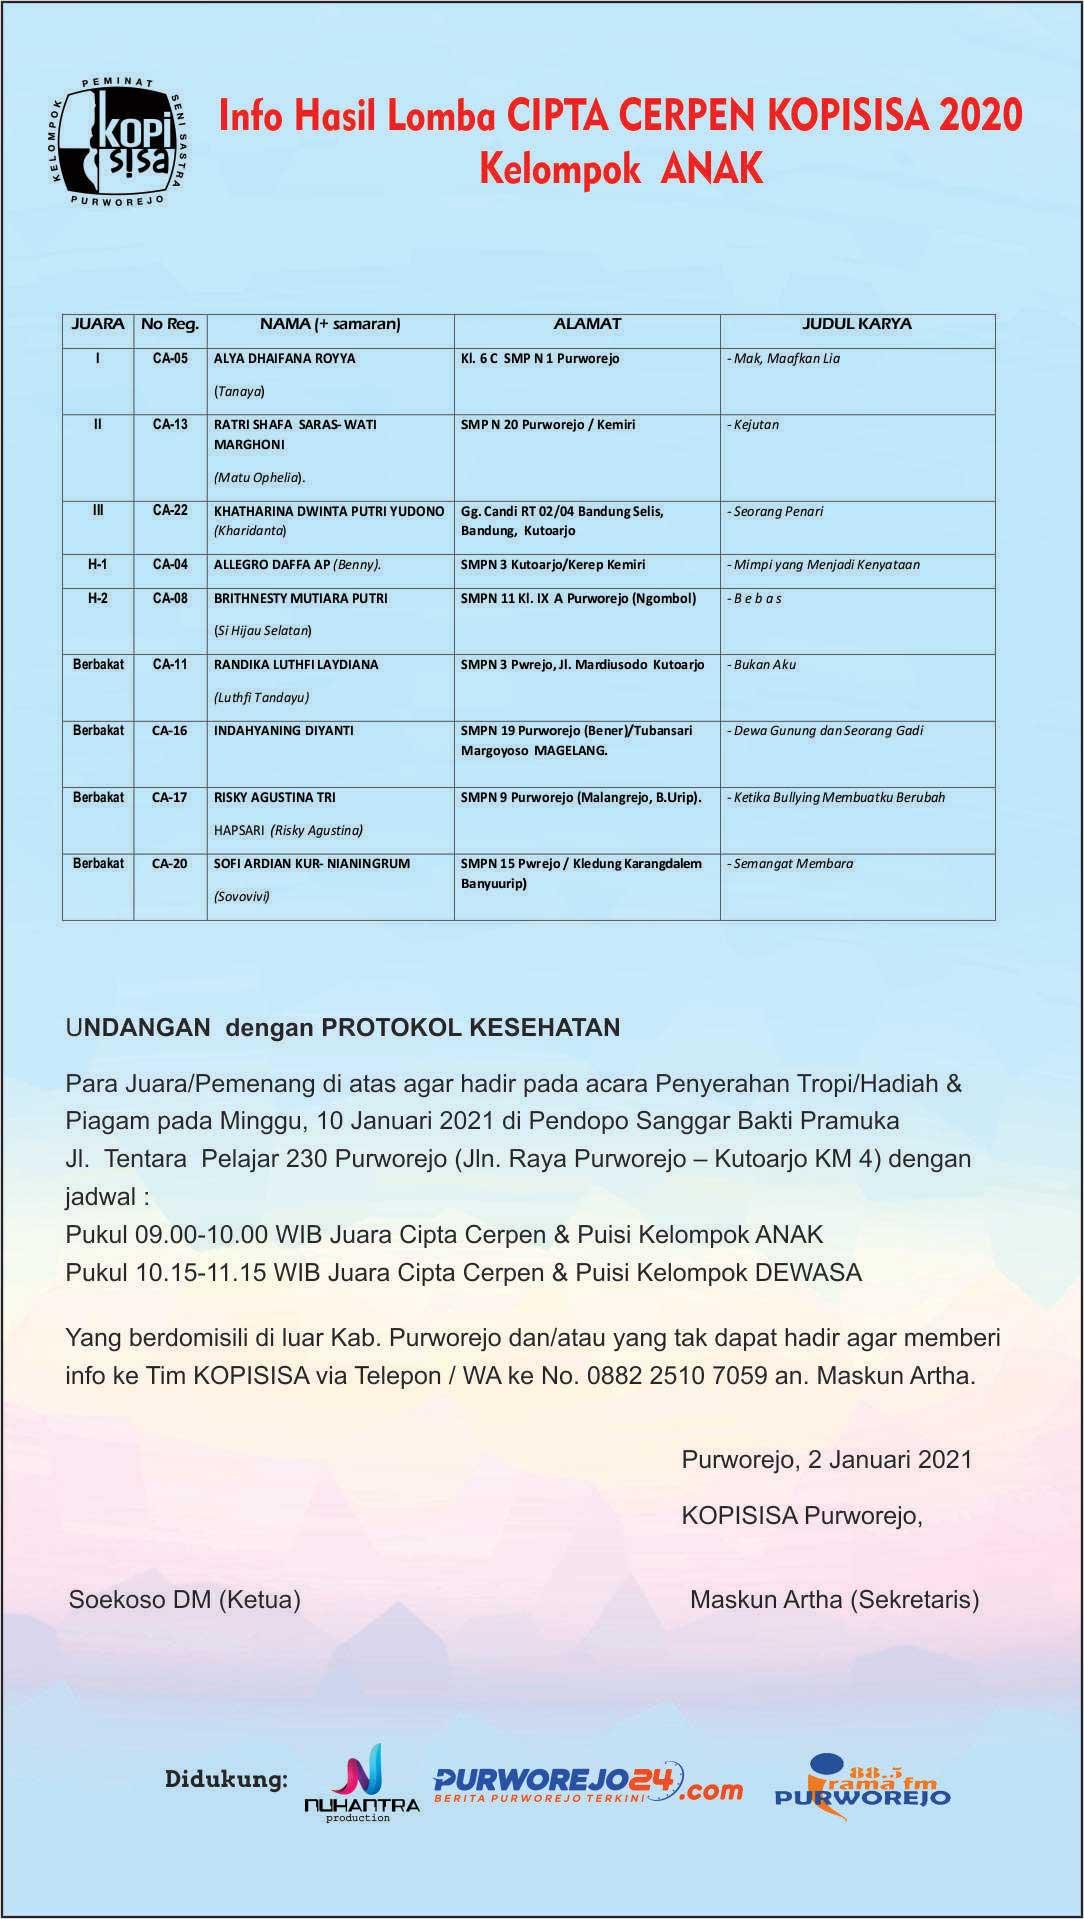 Info Hasil Lomba CIPTA CERPEN KOPISISA 2020 kelompok anak